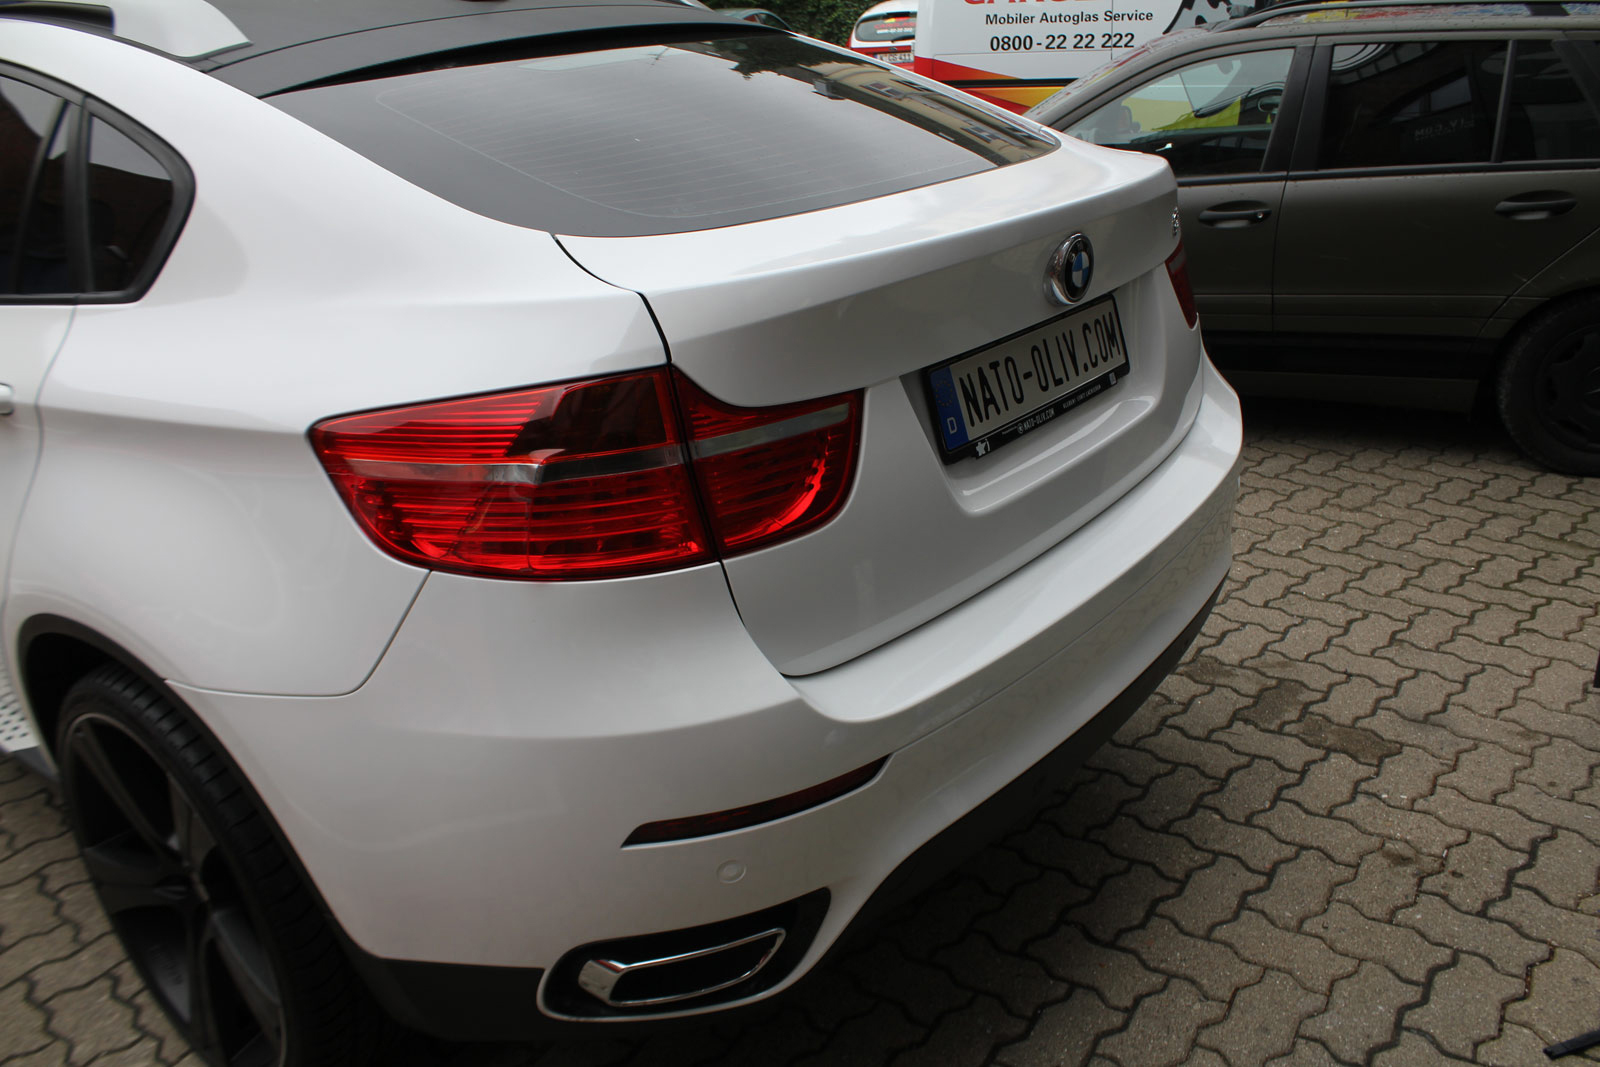 BMW_X6_FOLIERUNG_WEISS_GLANZ_PLUS_CARBON_05